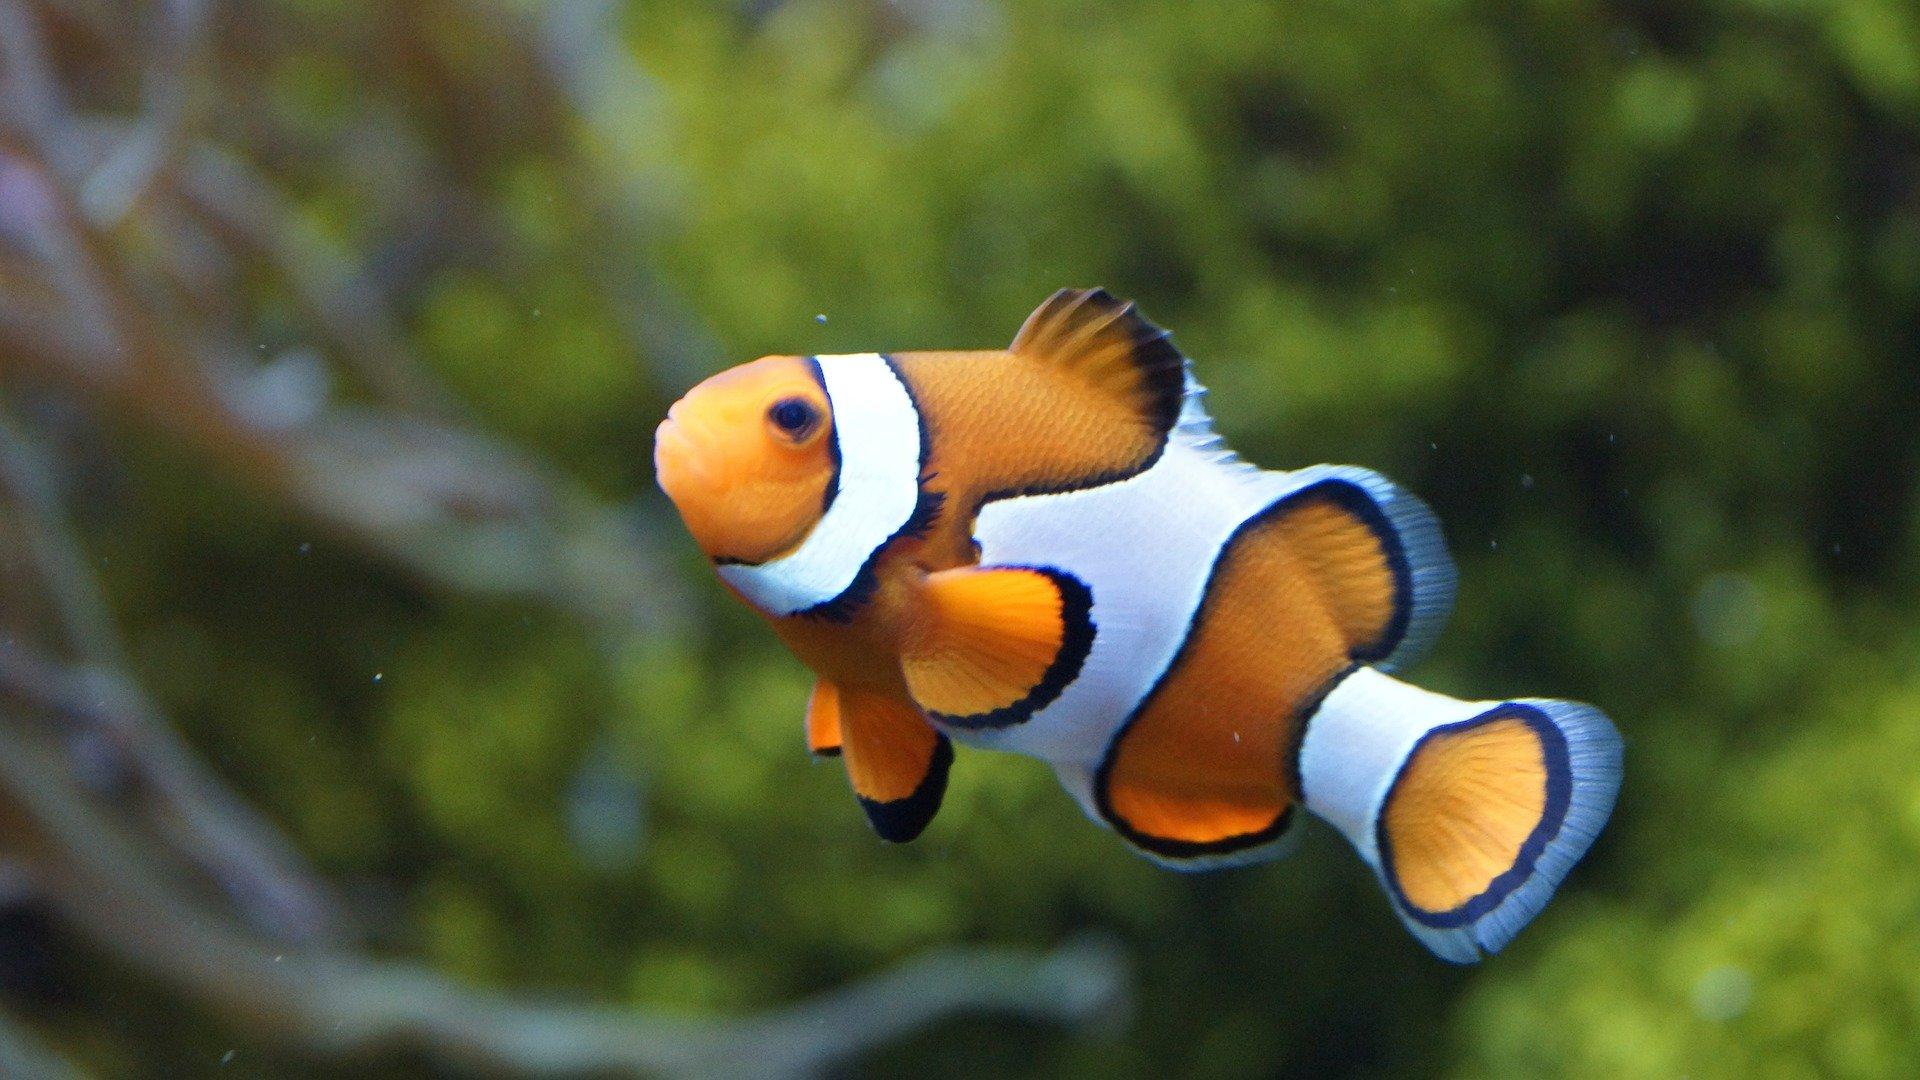 The Nemo Effect Is Untrue Animal Movies Promote